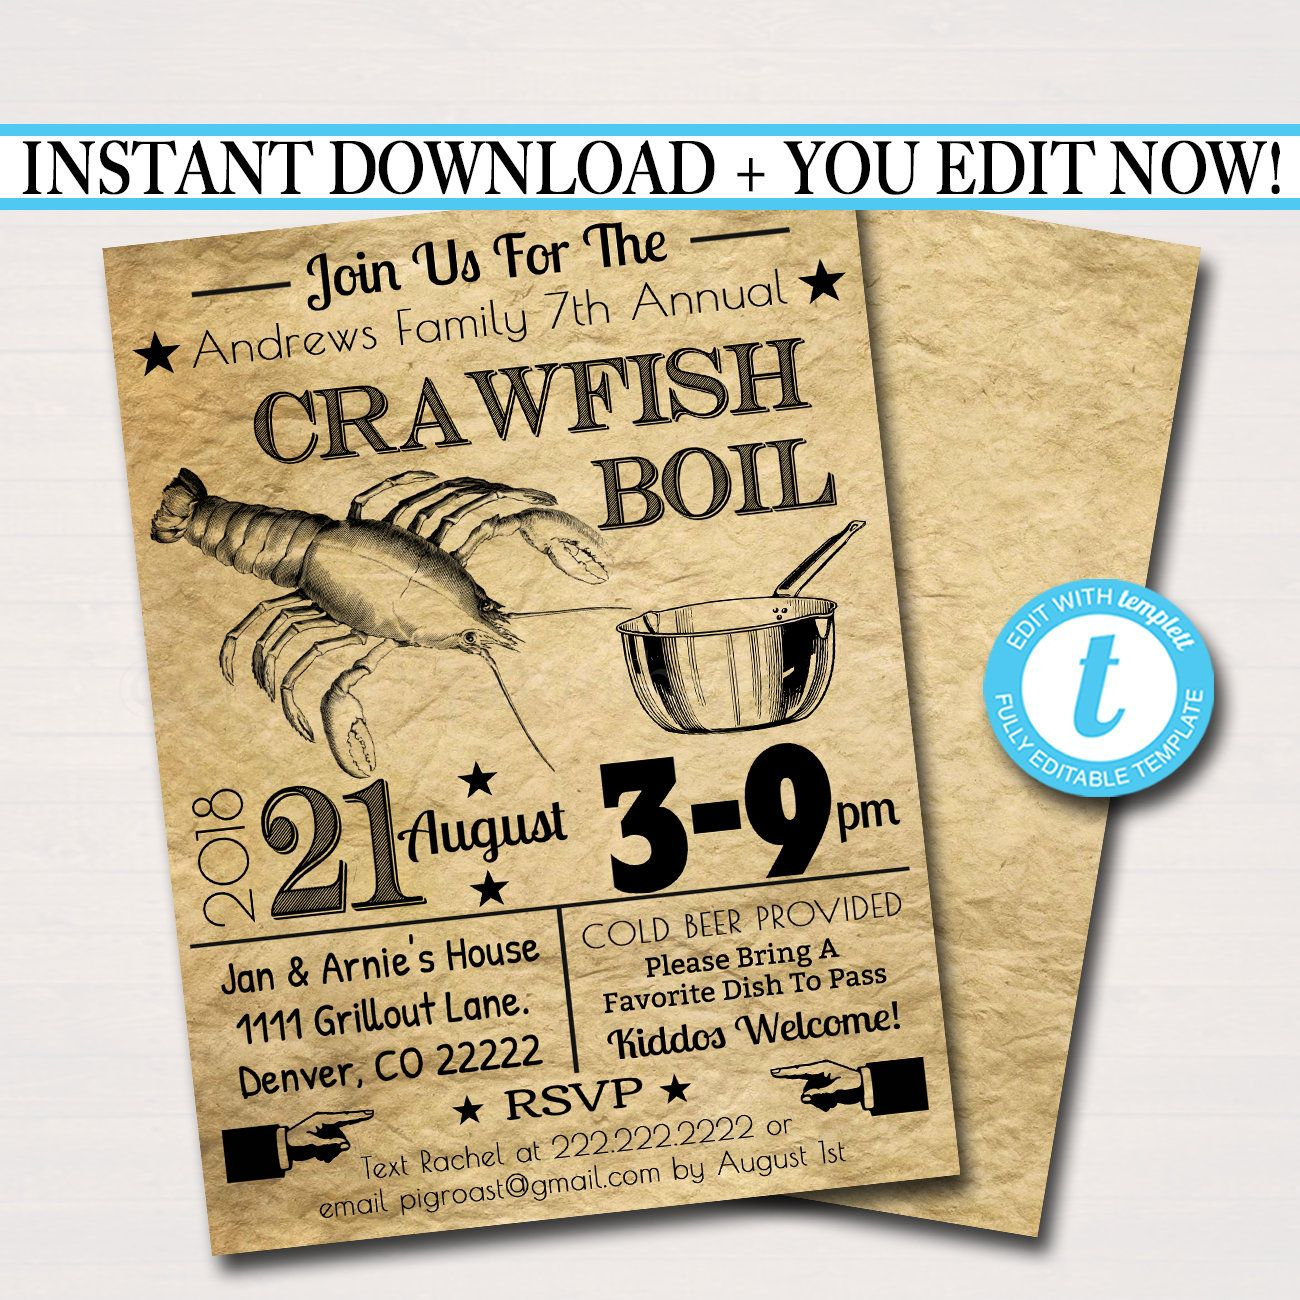 EDITABLE Crawfish Boil Invitation, Company Picnic, Family Picnic BBQ, Seafood Lobster Shrimp Boil, Barbecue Summer Backyard Party Invite